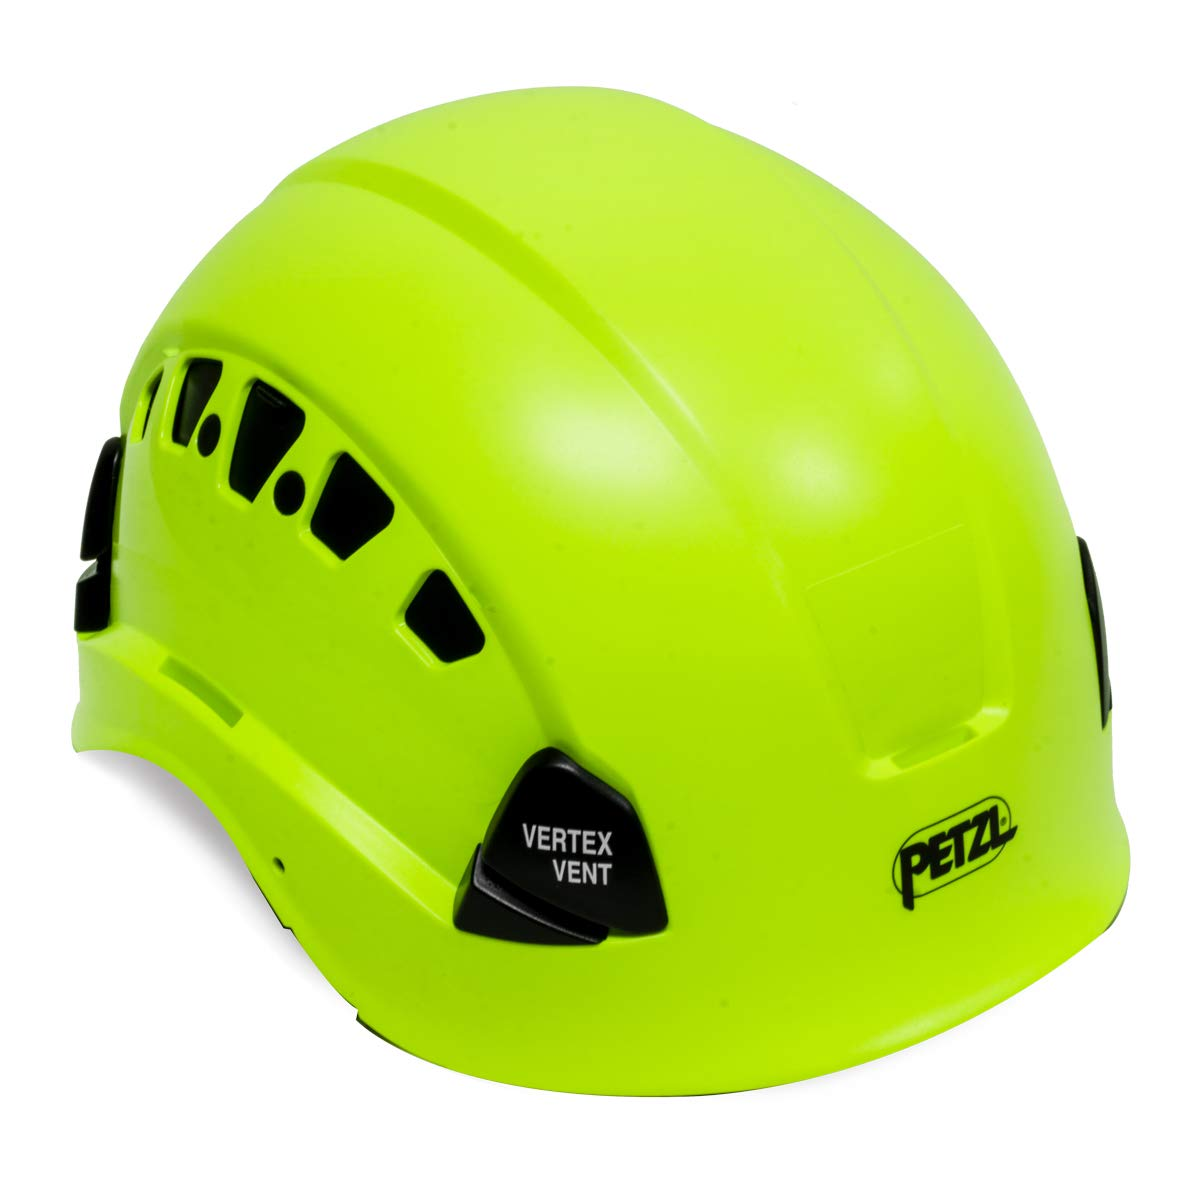 Petzl Vertex Vent Hi-Viz Visibility Yellow Climbing Helmet A10VYAHV by PETZL (Image #1)